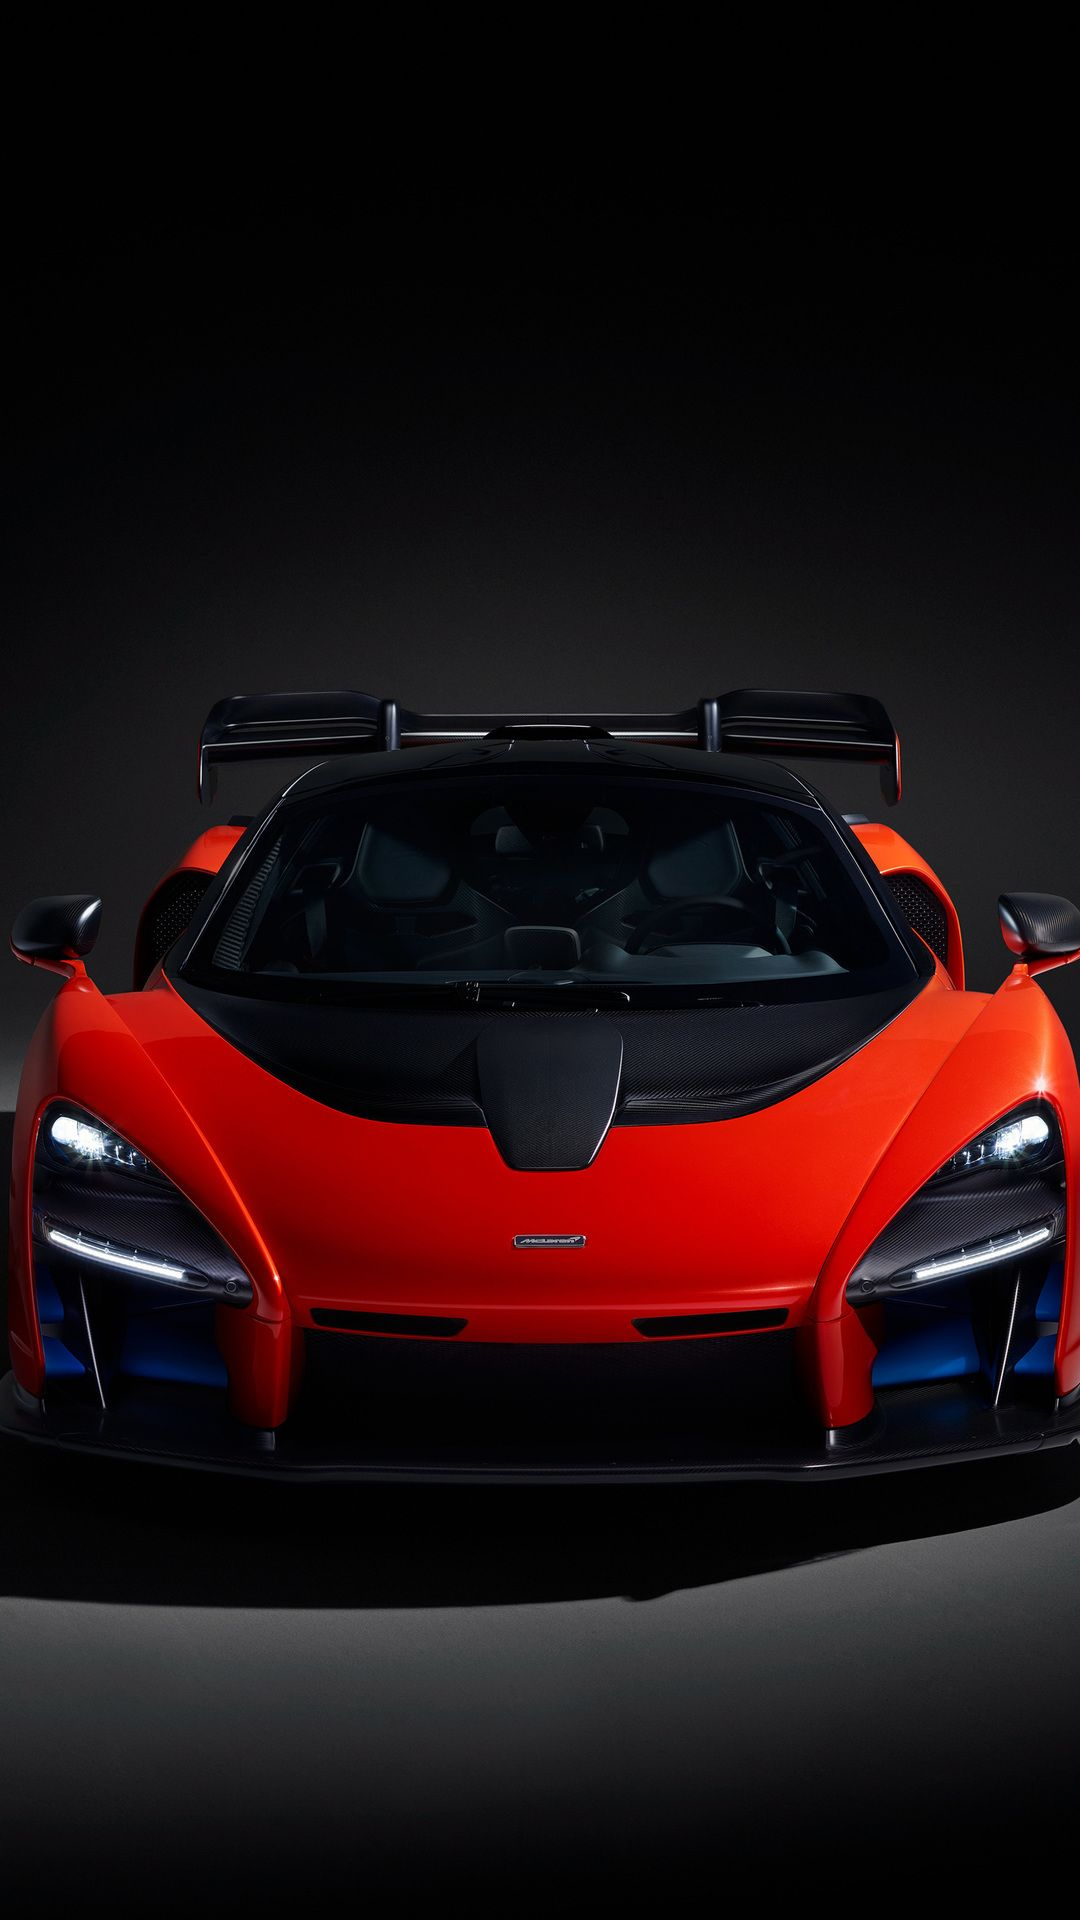 McLaren Senna Sports cars luxury, Best luxury cars